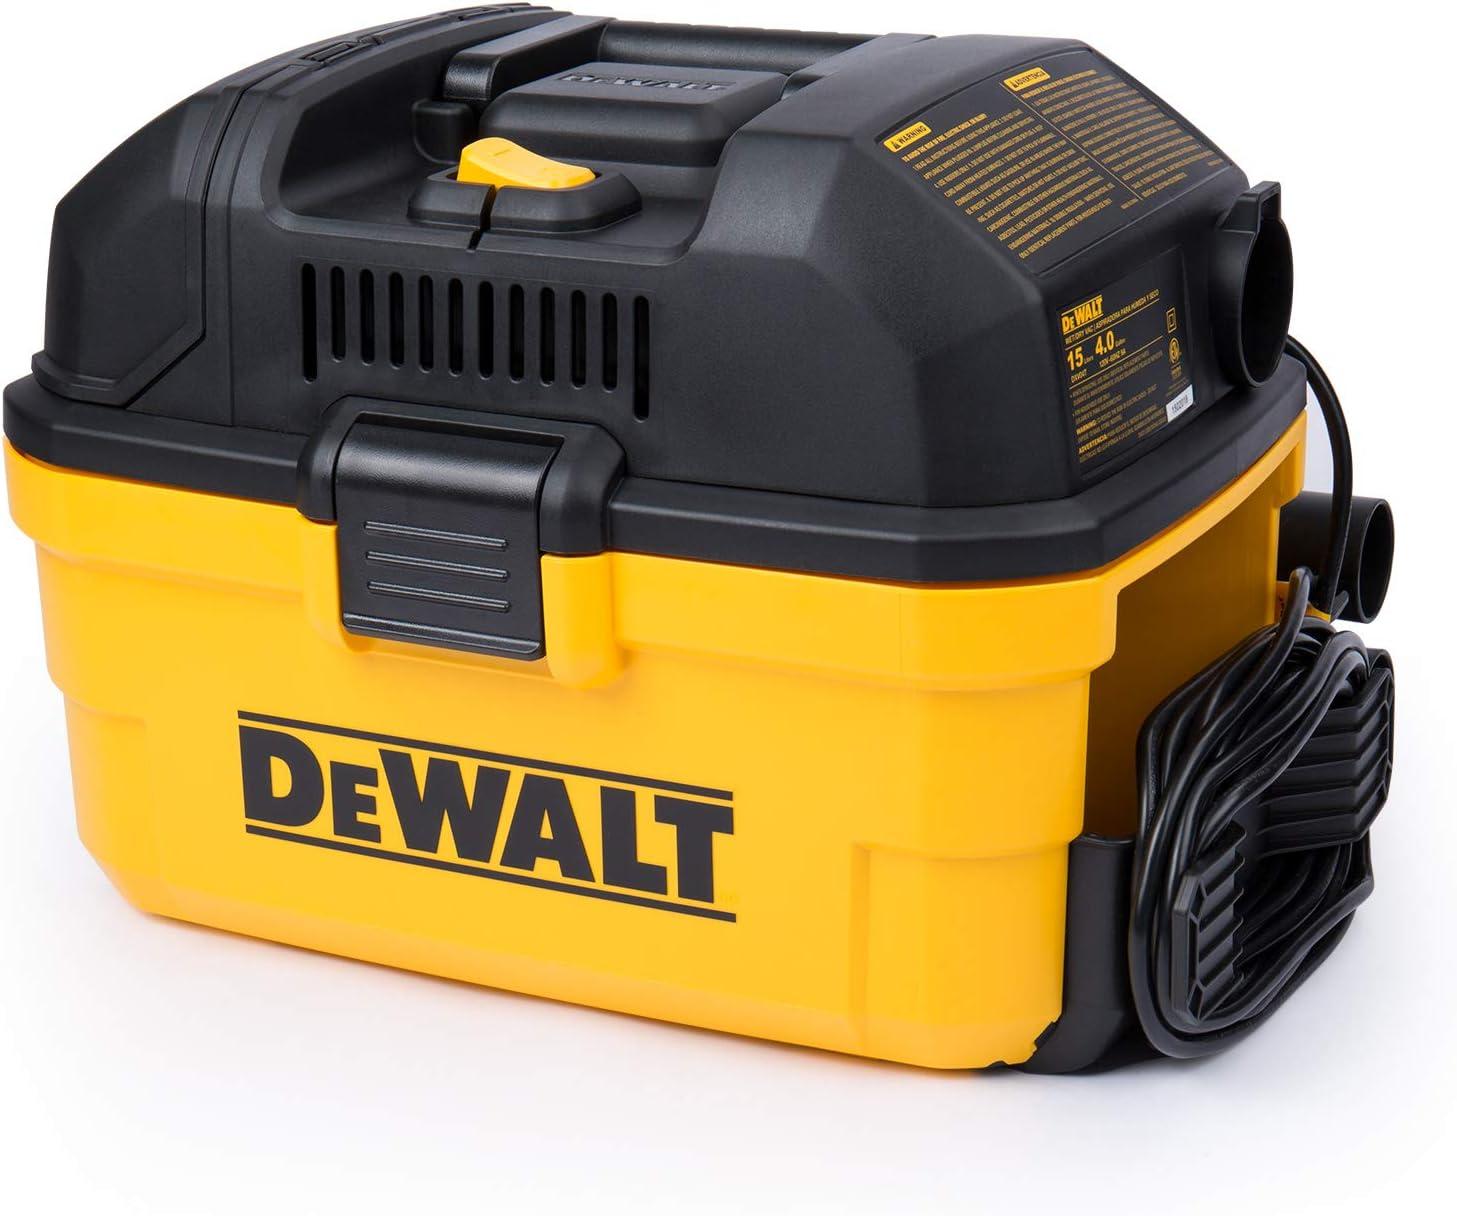 DEWALT DXV04T Portable 4 gallon Wet/Dry Vaccum, Yellow: Industrial & Scientific